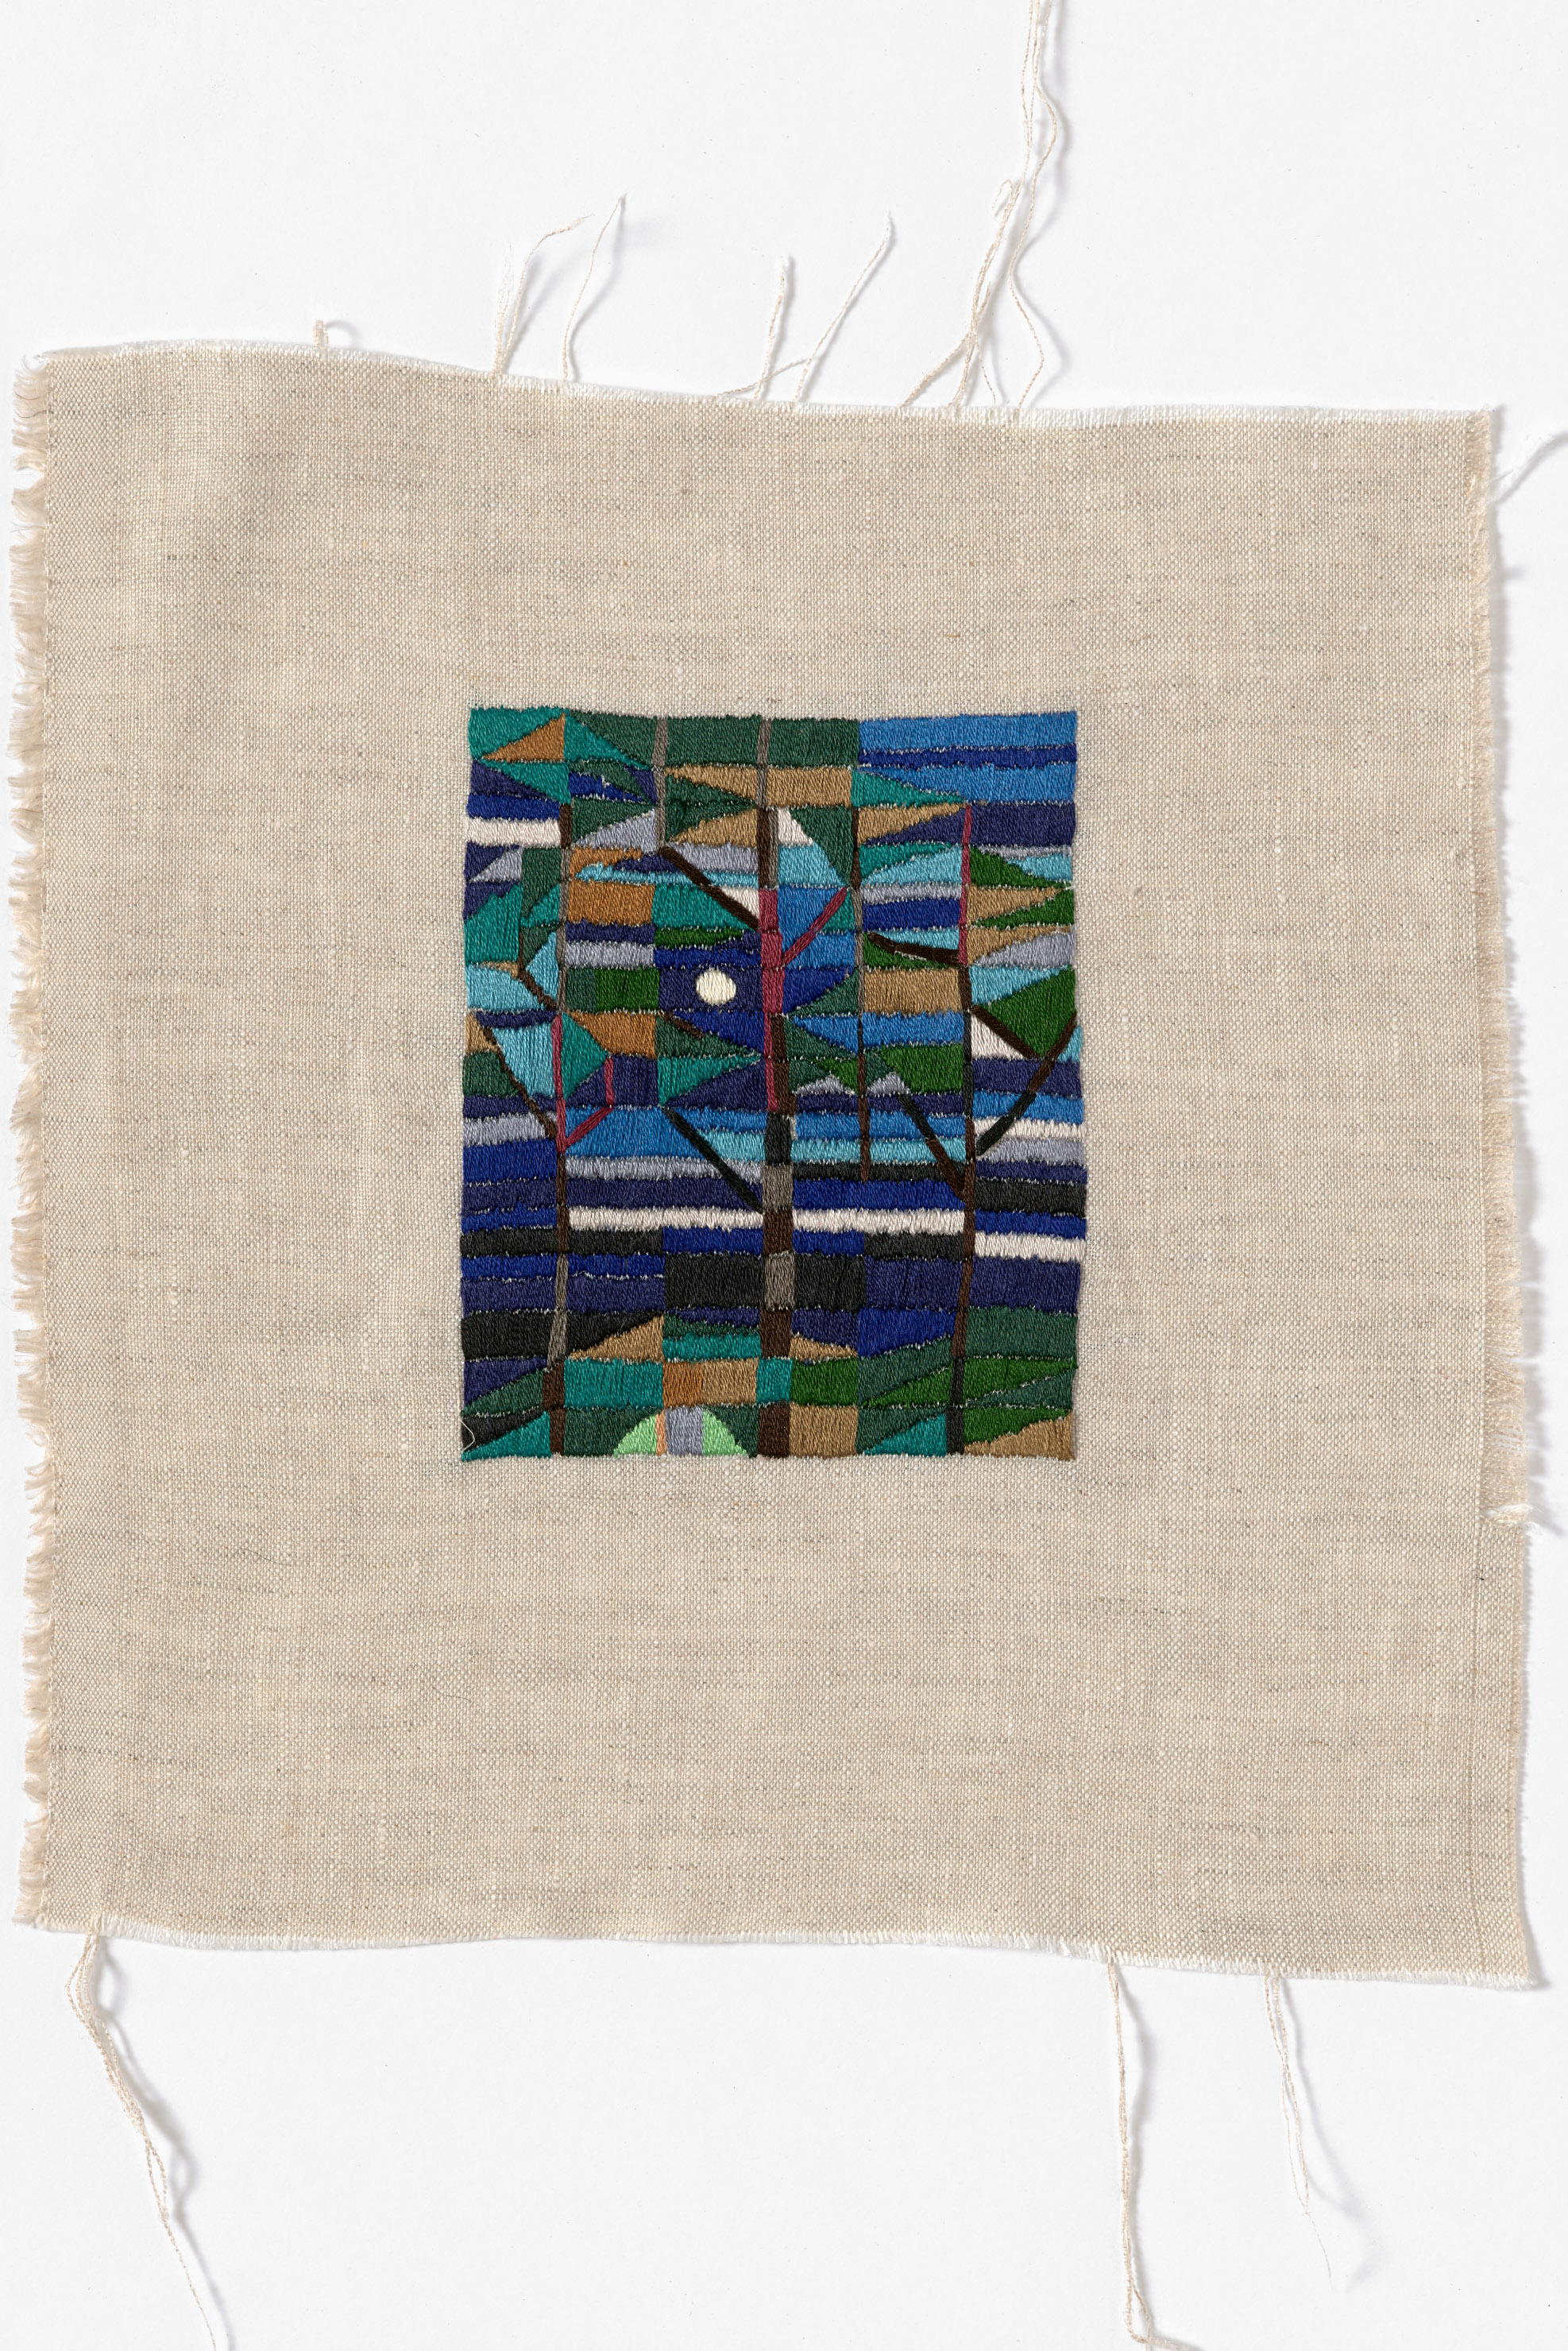 Glen Forbes, midnight  2014 Cotton thread on linen 26 x 28cm